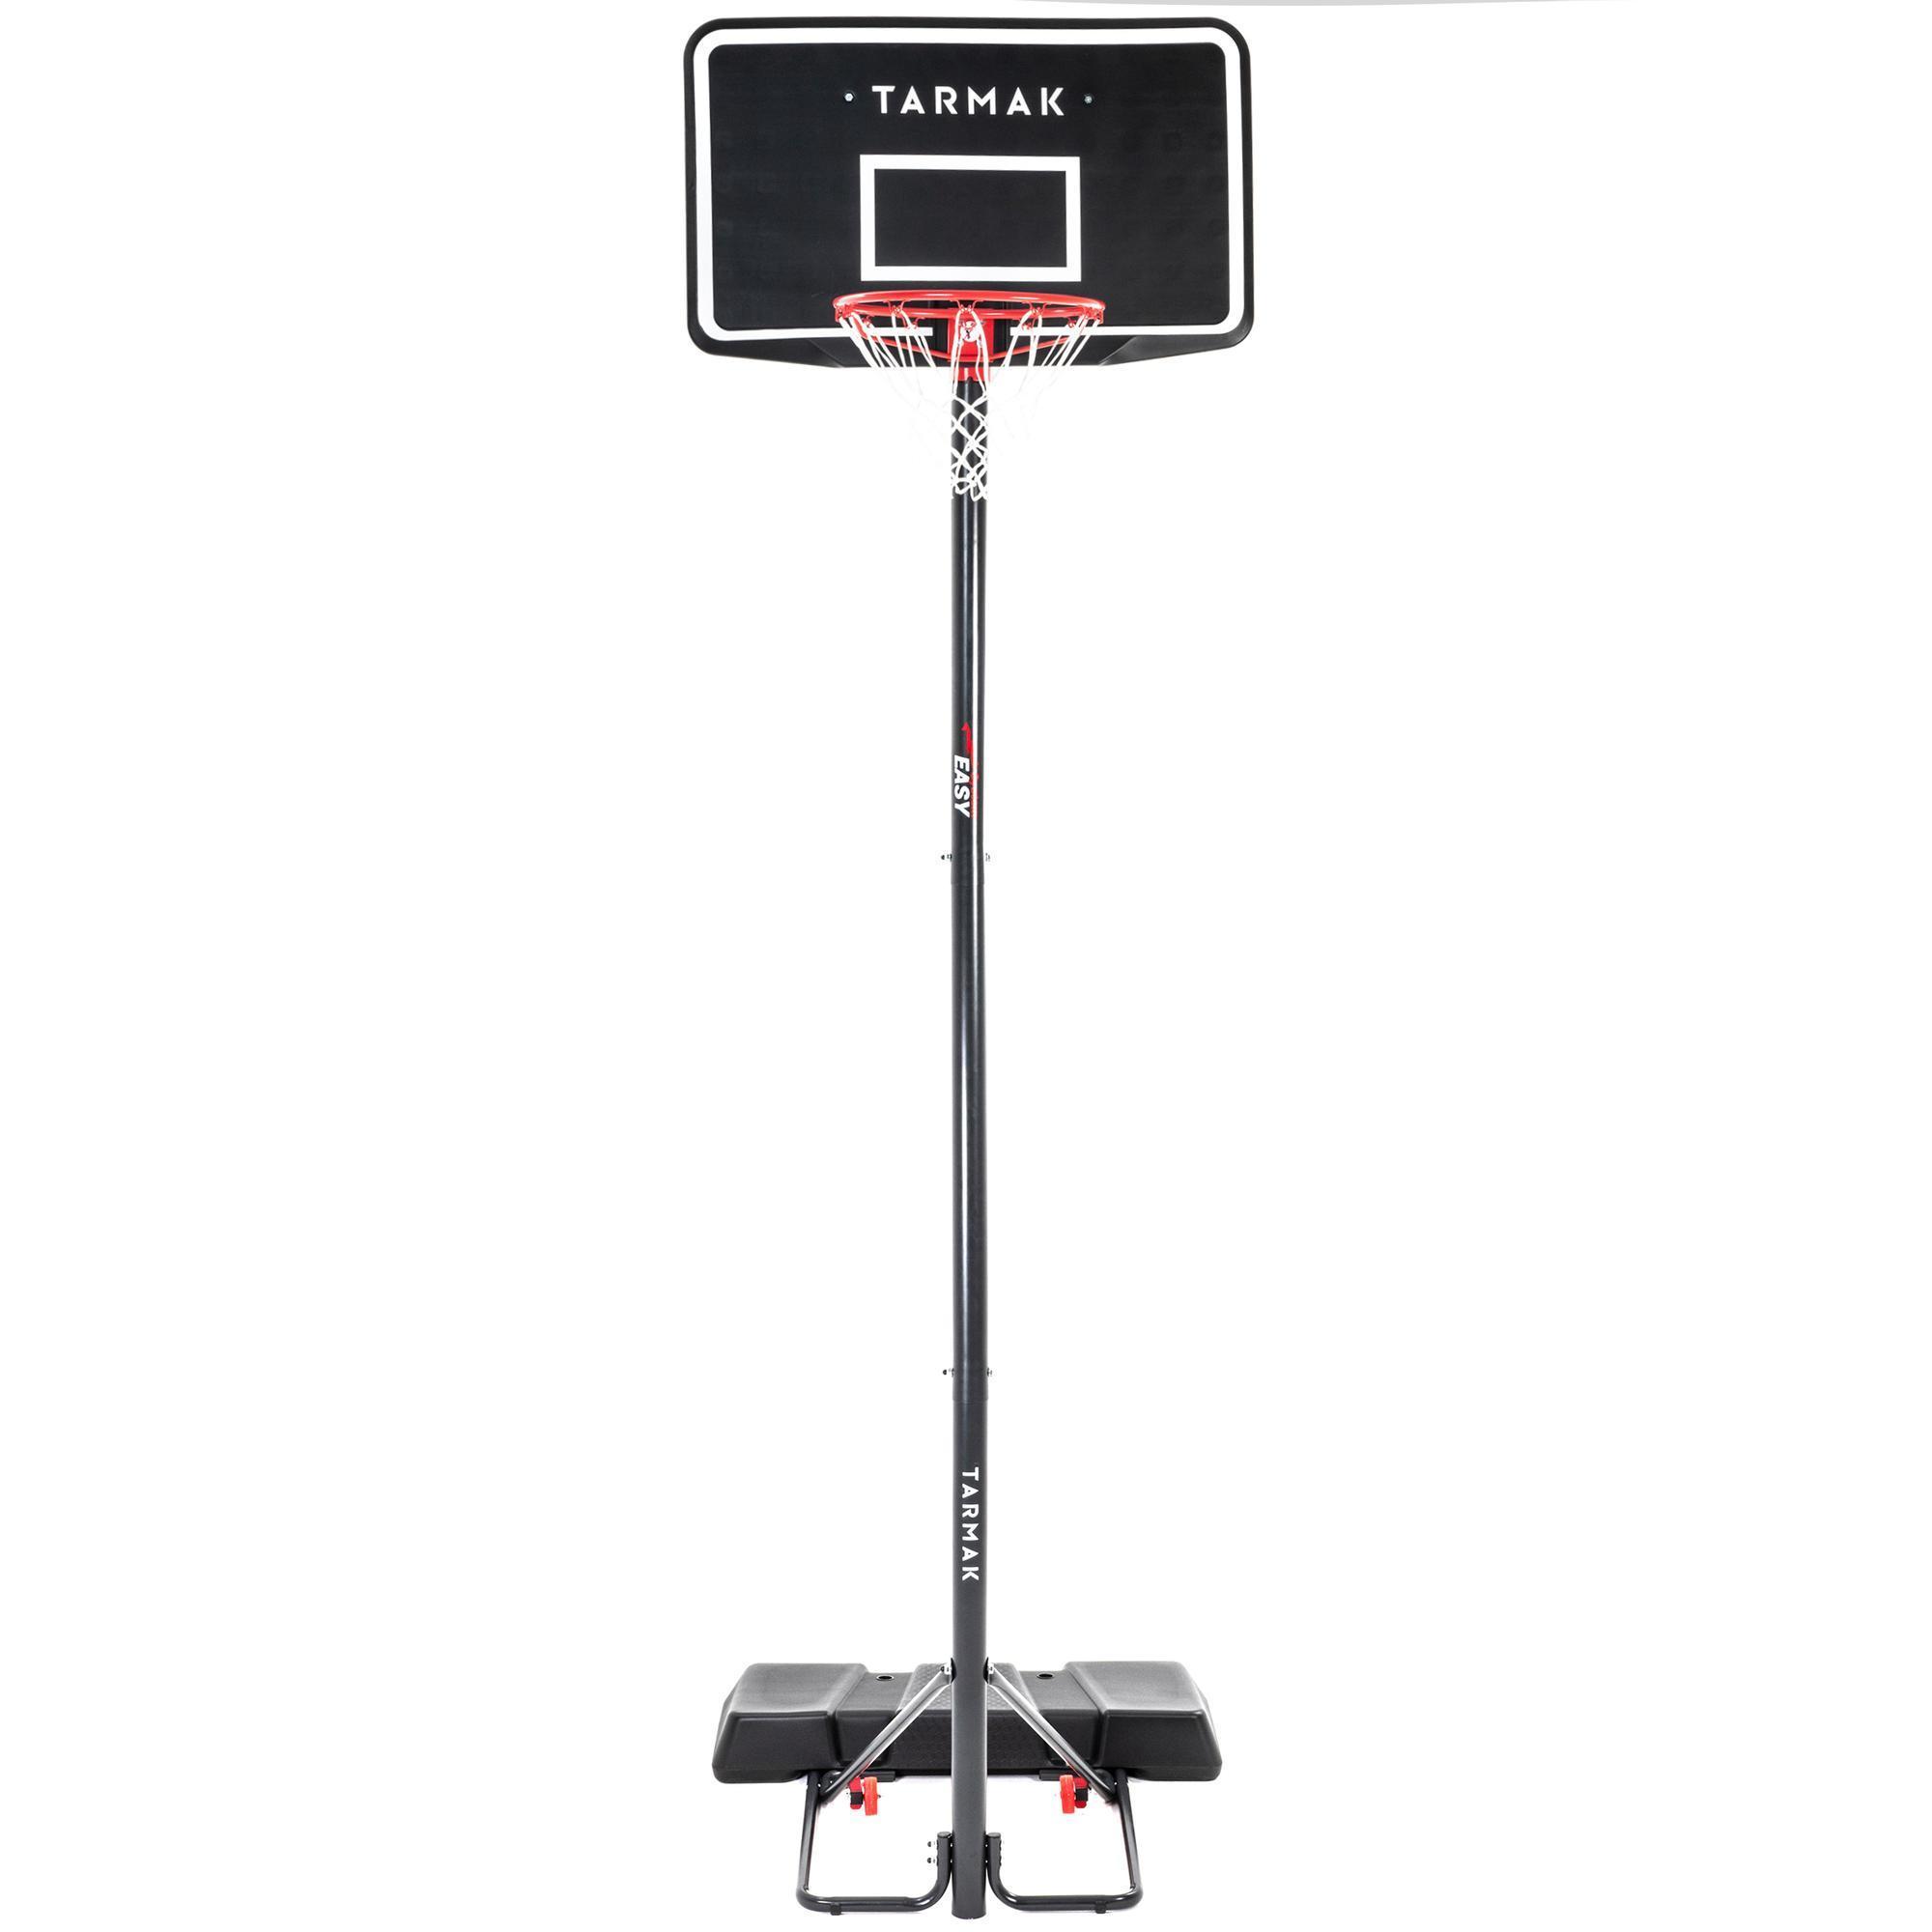 Basketball B100 Easy Kids  Adult Basketball Basket 2.2m to 3.05m tool-free  adjustment. - Decathlon 25449c9d17d57